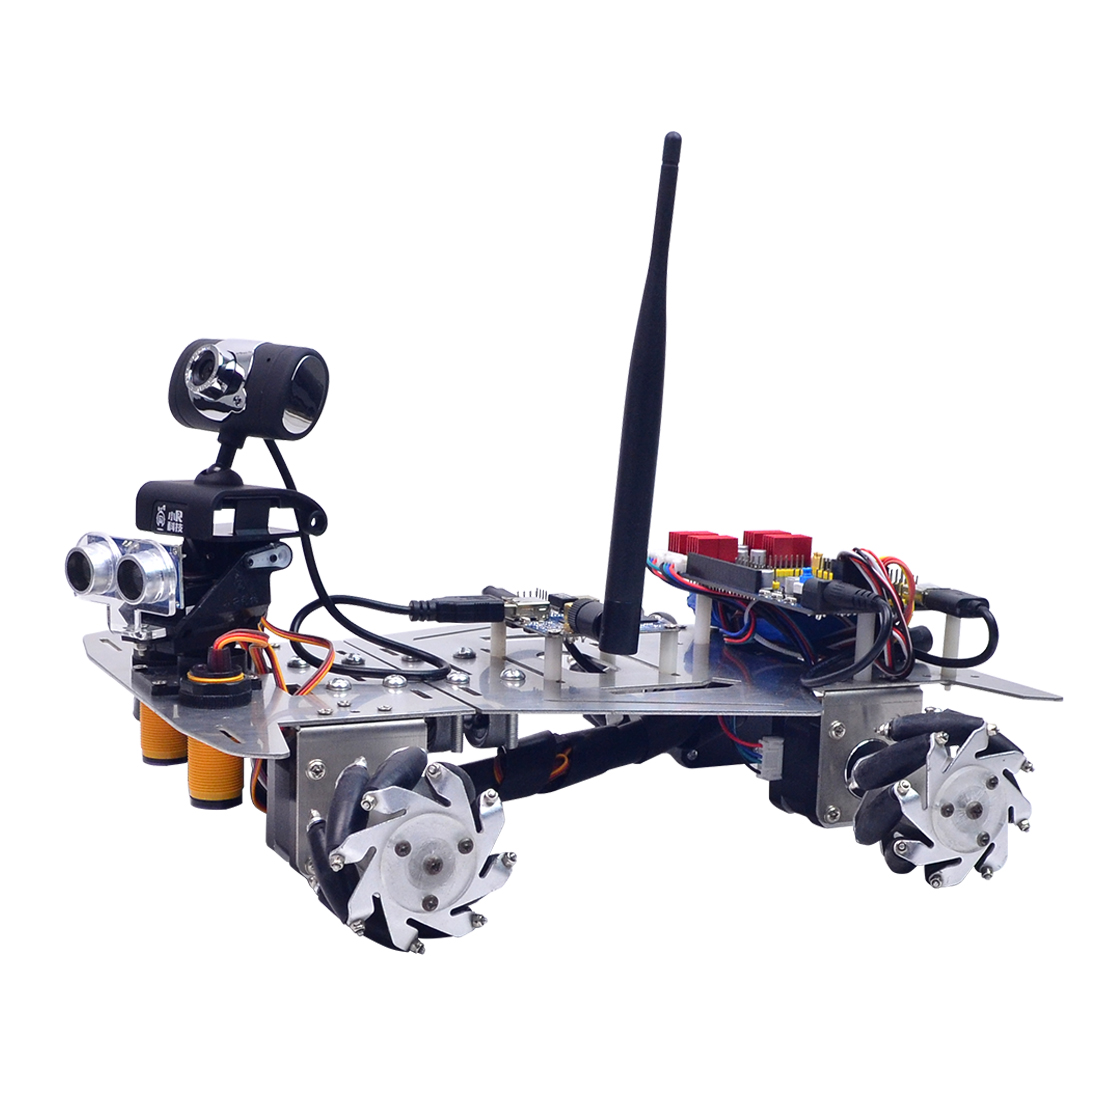 XR Master Omni-Directional Mecanum Wheel Robot Programmable Toys For Kids Boys - WIFI Version / WIFI + Bluetooth Version